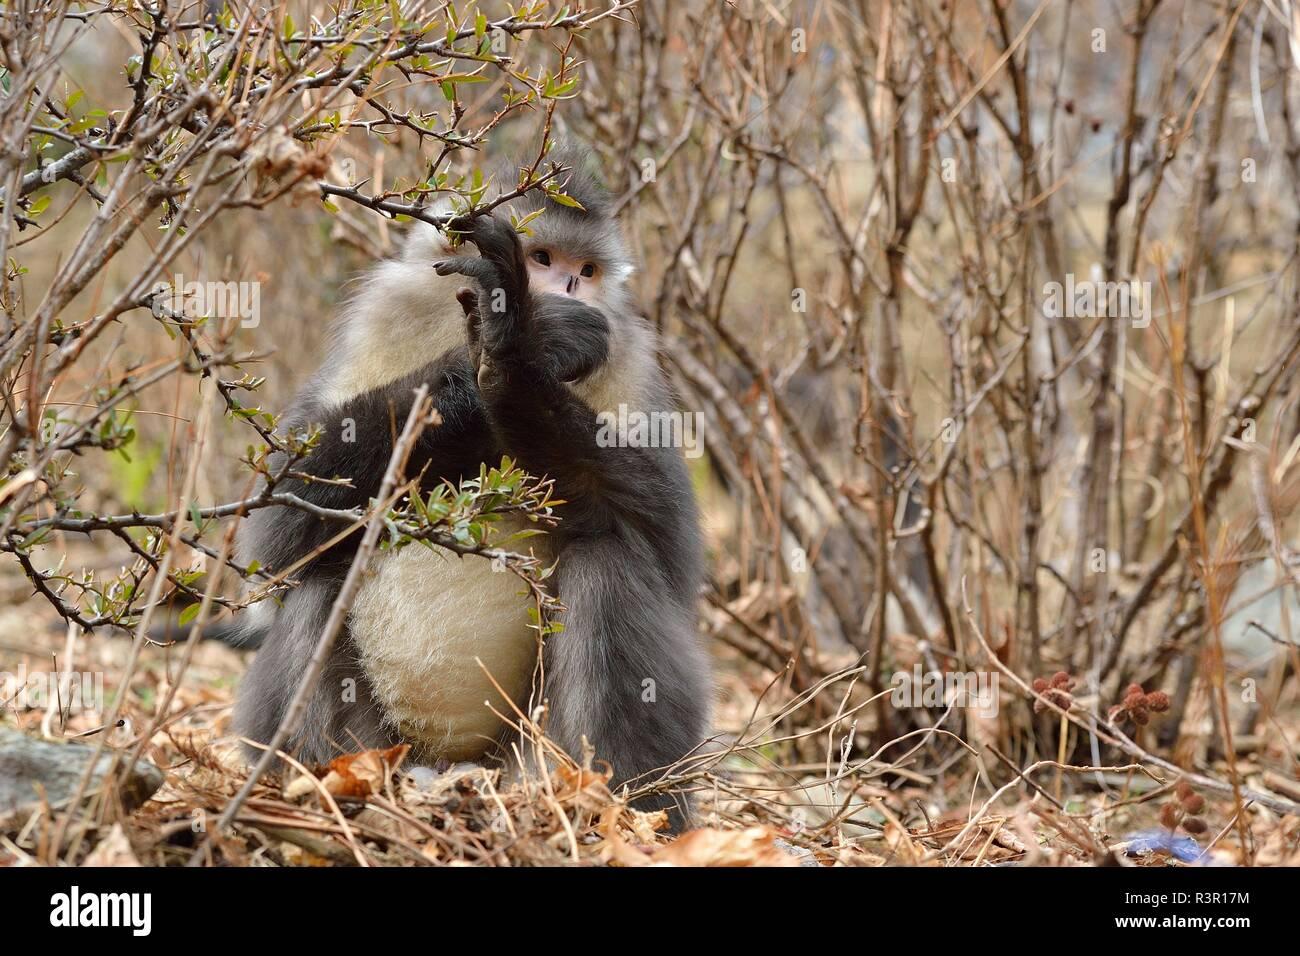 Black Snub-nosed Monkey (Rhinopithecus bieti) eating on ground, Yunnan, China - Stock Image